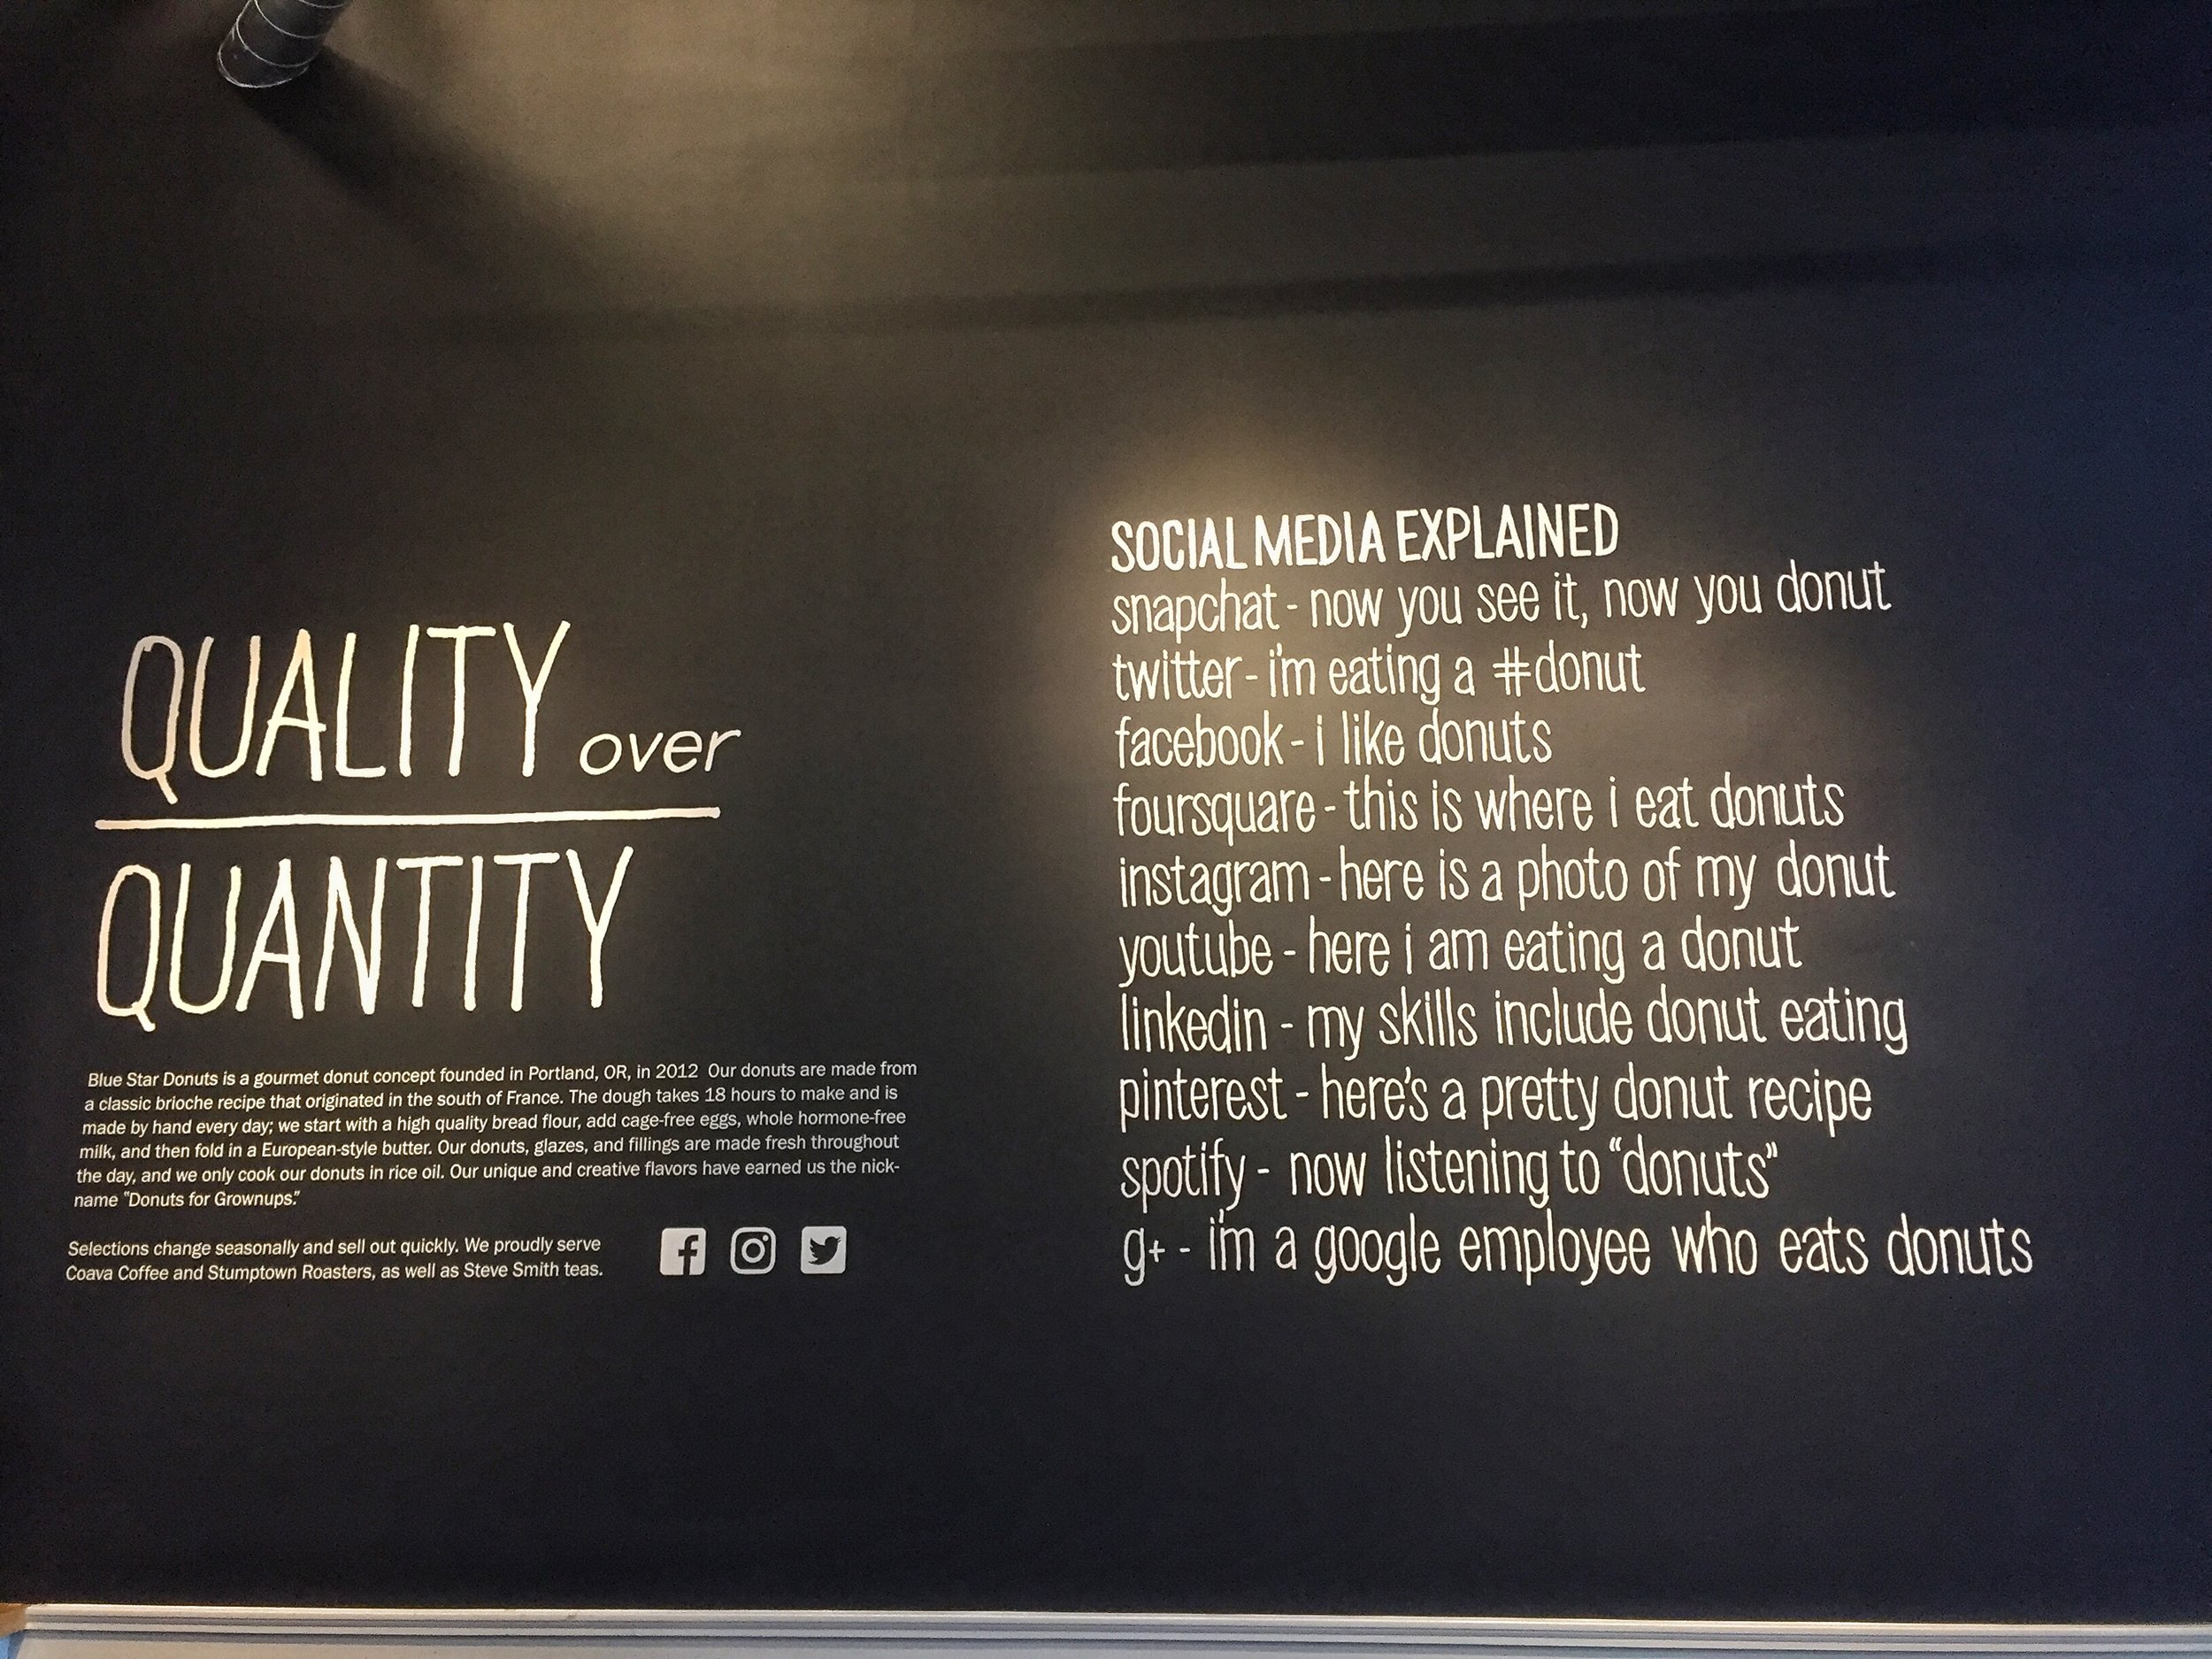 Social media explained at Blue Star Donuts.